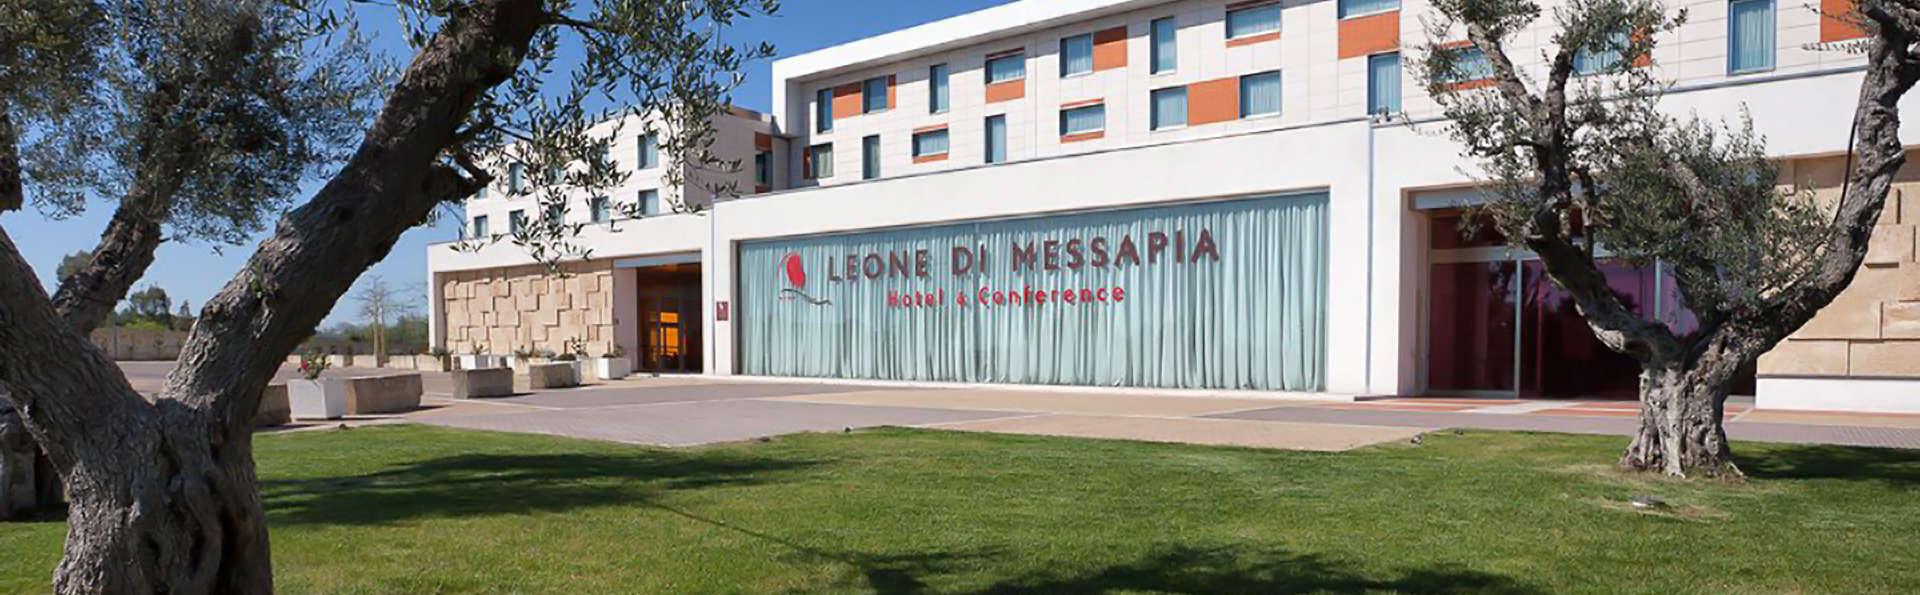 Best Western Plus Leone di Messapia Hotel & Conference - Edit_front.jpg